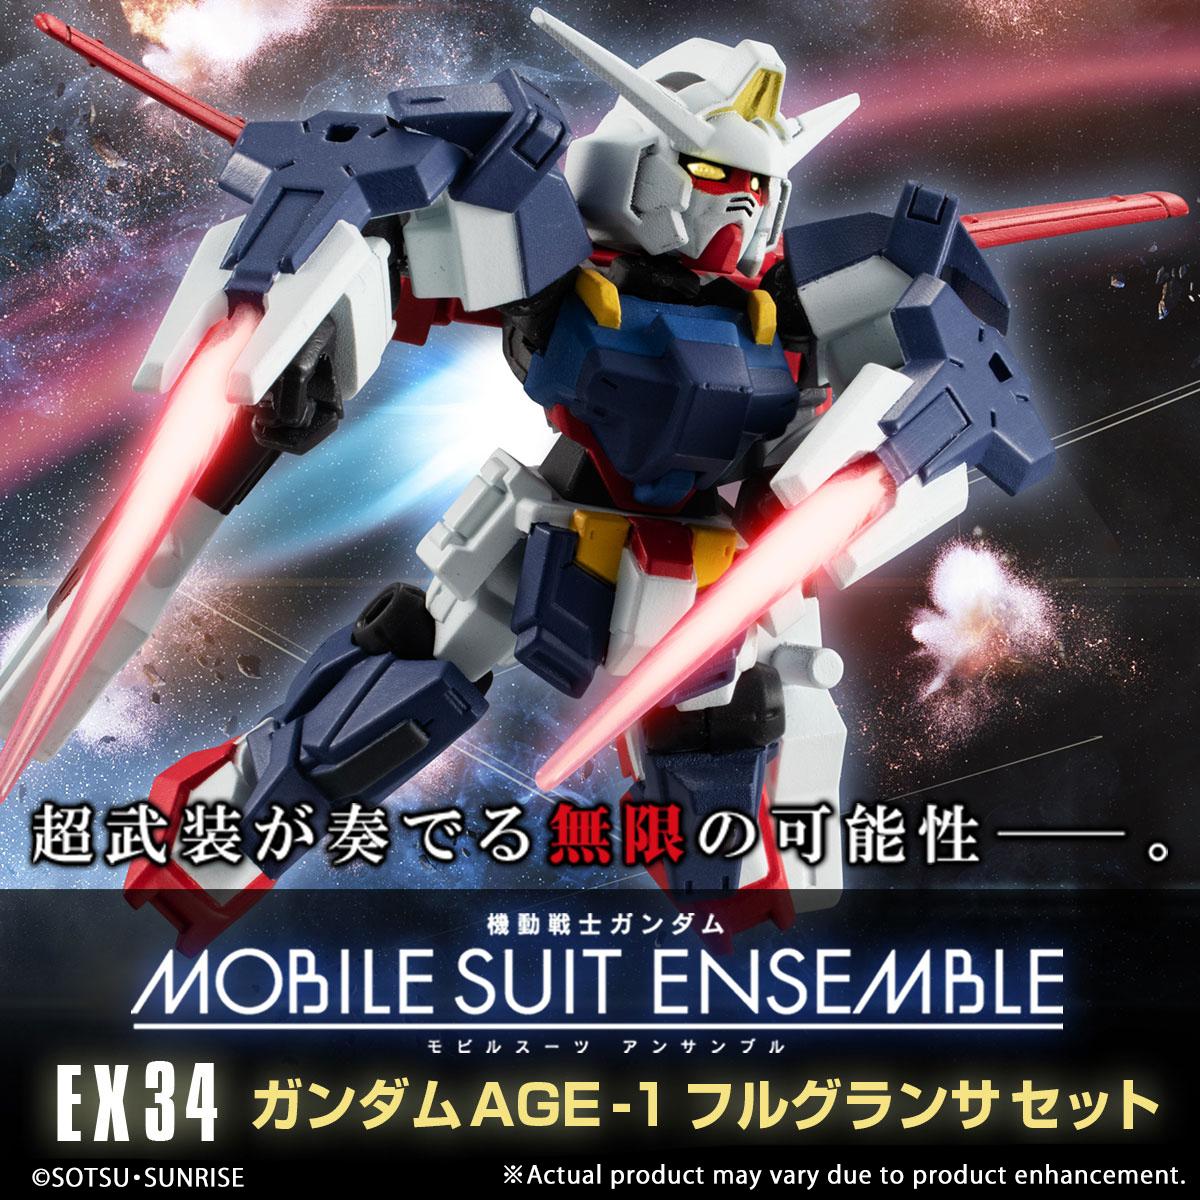 MOBILE SUIT ENSEMBLE EX34 GUNDAM AGE-1 FULL GLANSA SET